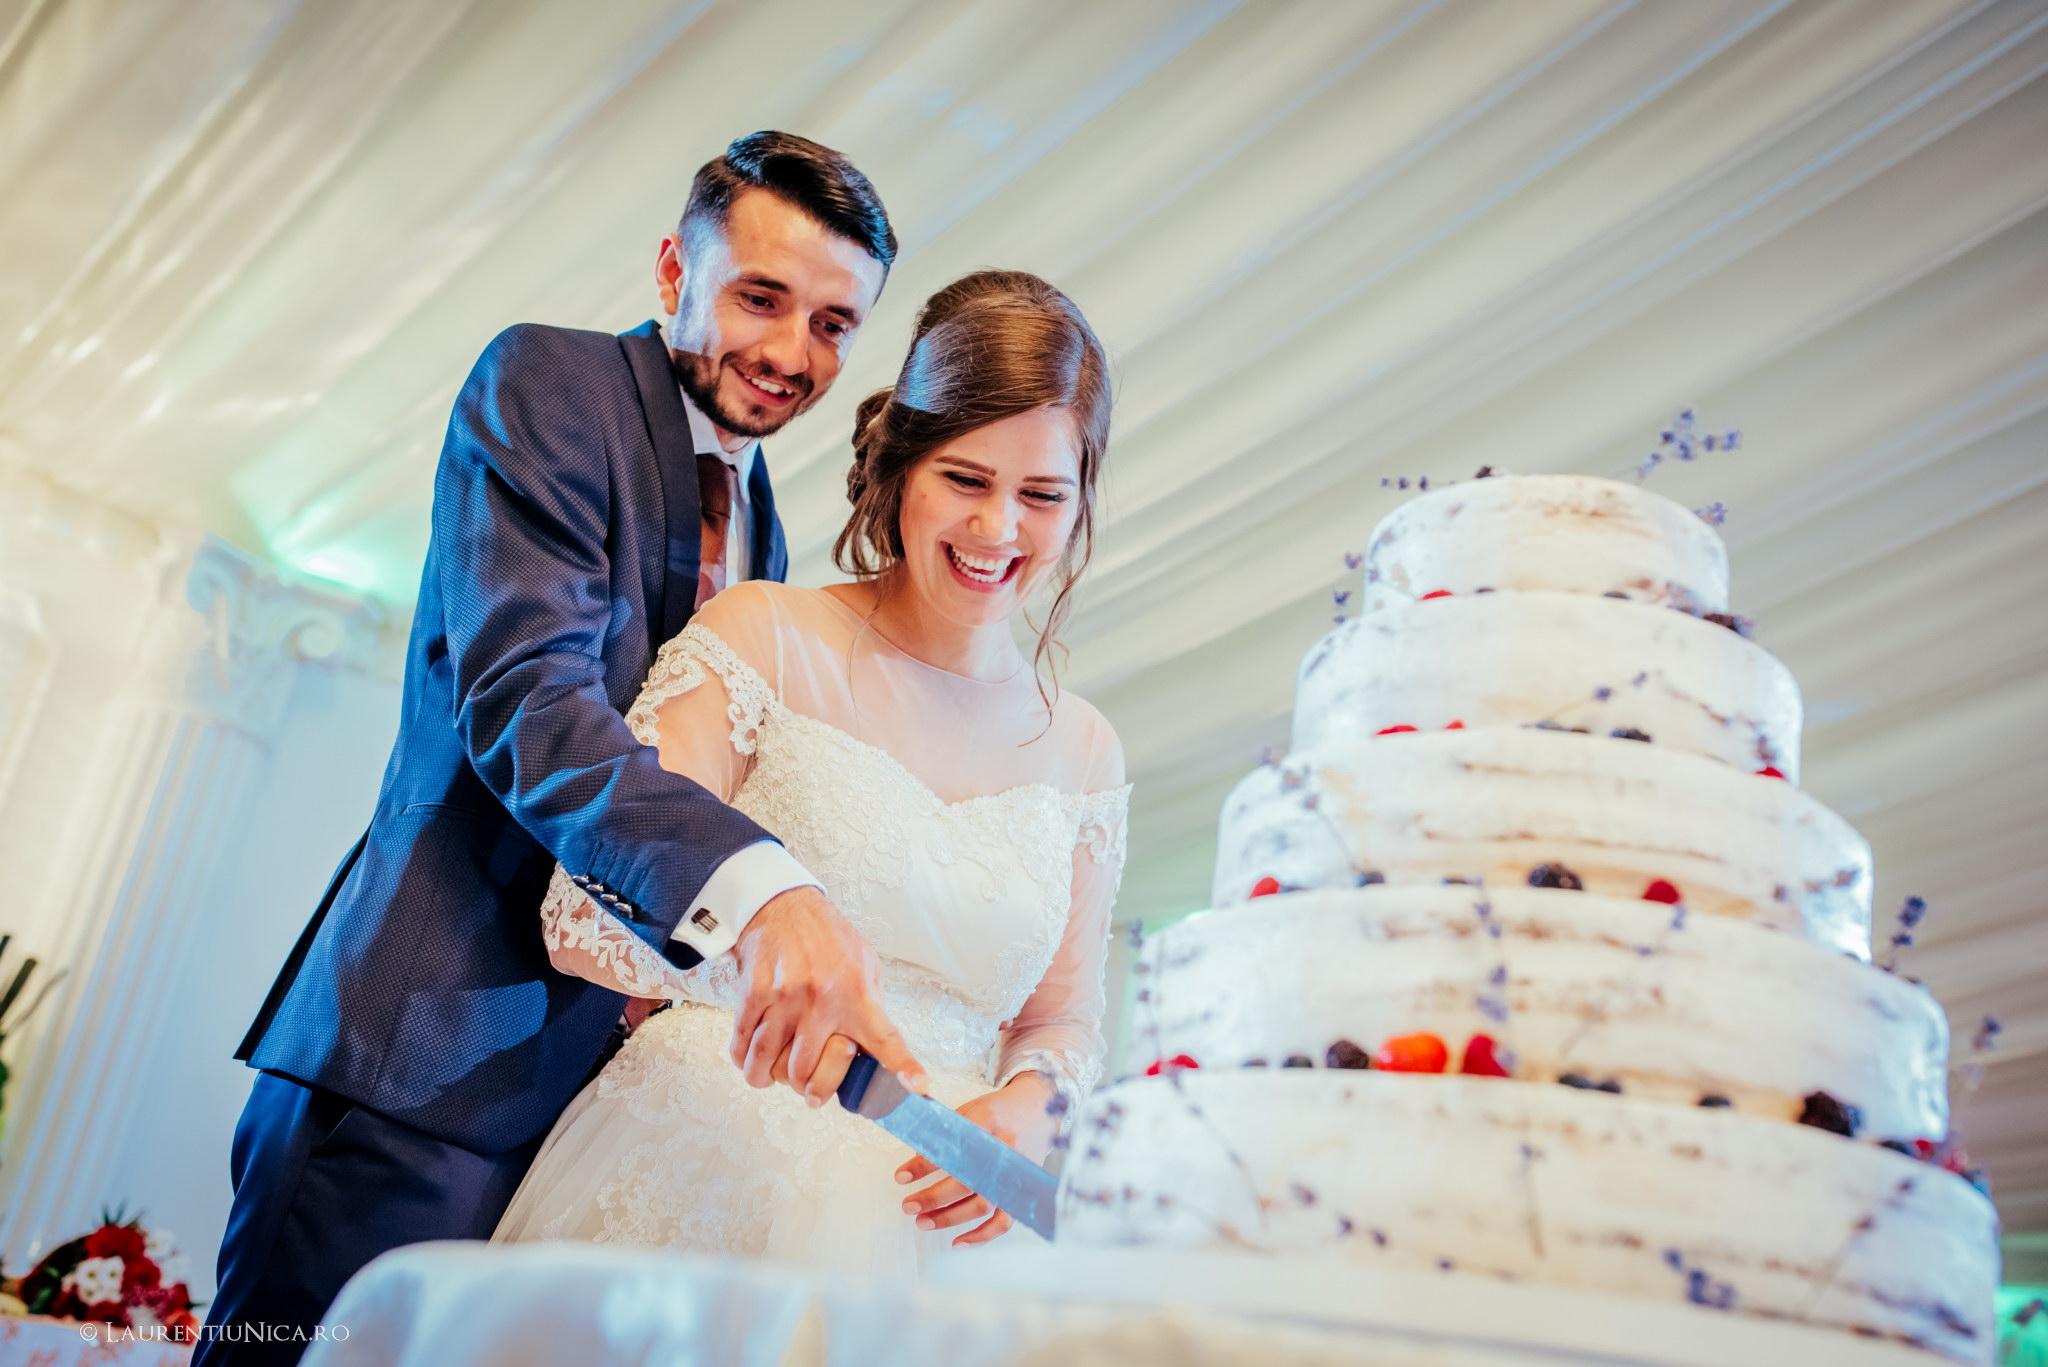 Alina si Andrei fotograf nunta laurentiu nica craiova 47 - Alina & Andrei | Fotografii nunta